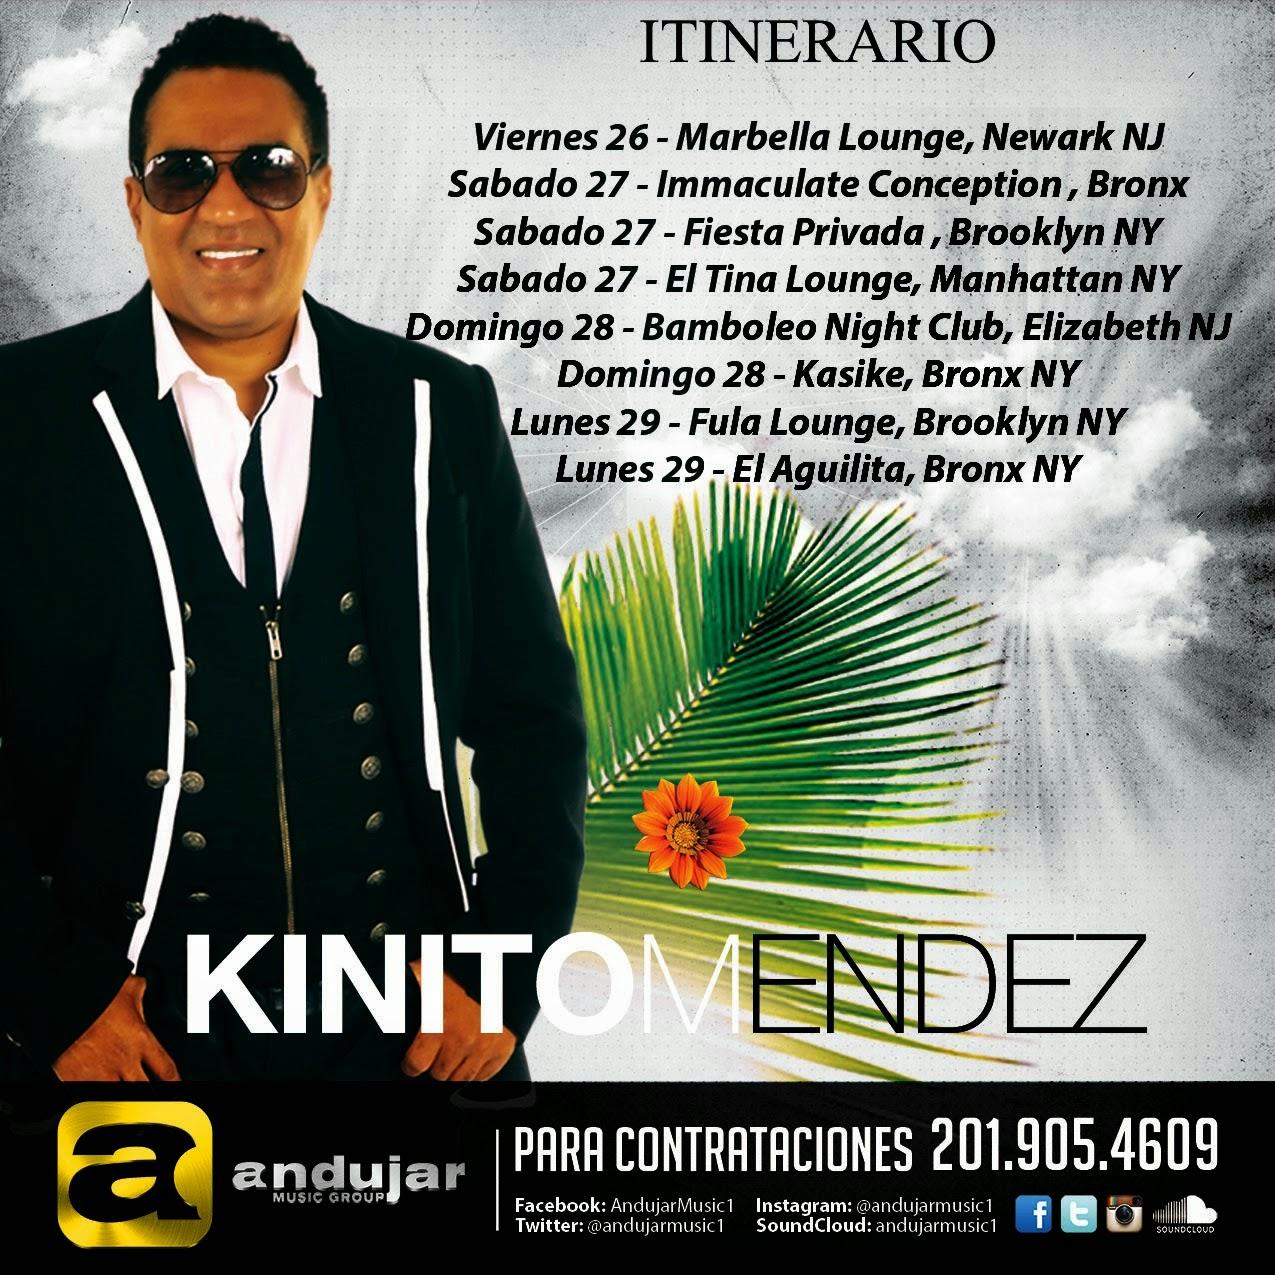 Itinerario Kinito Méndez 2014 USA